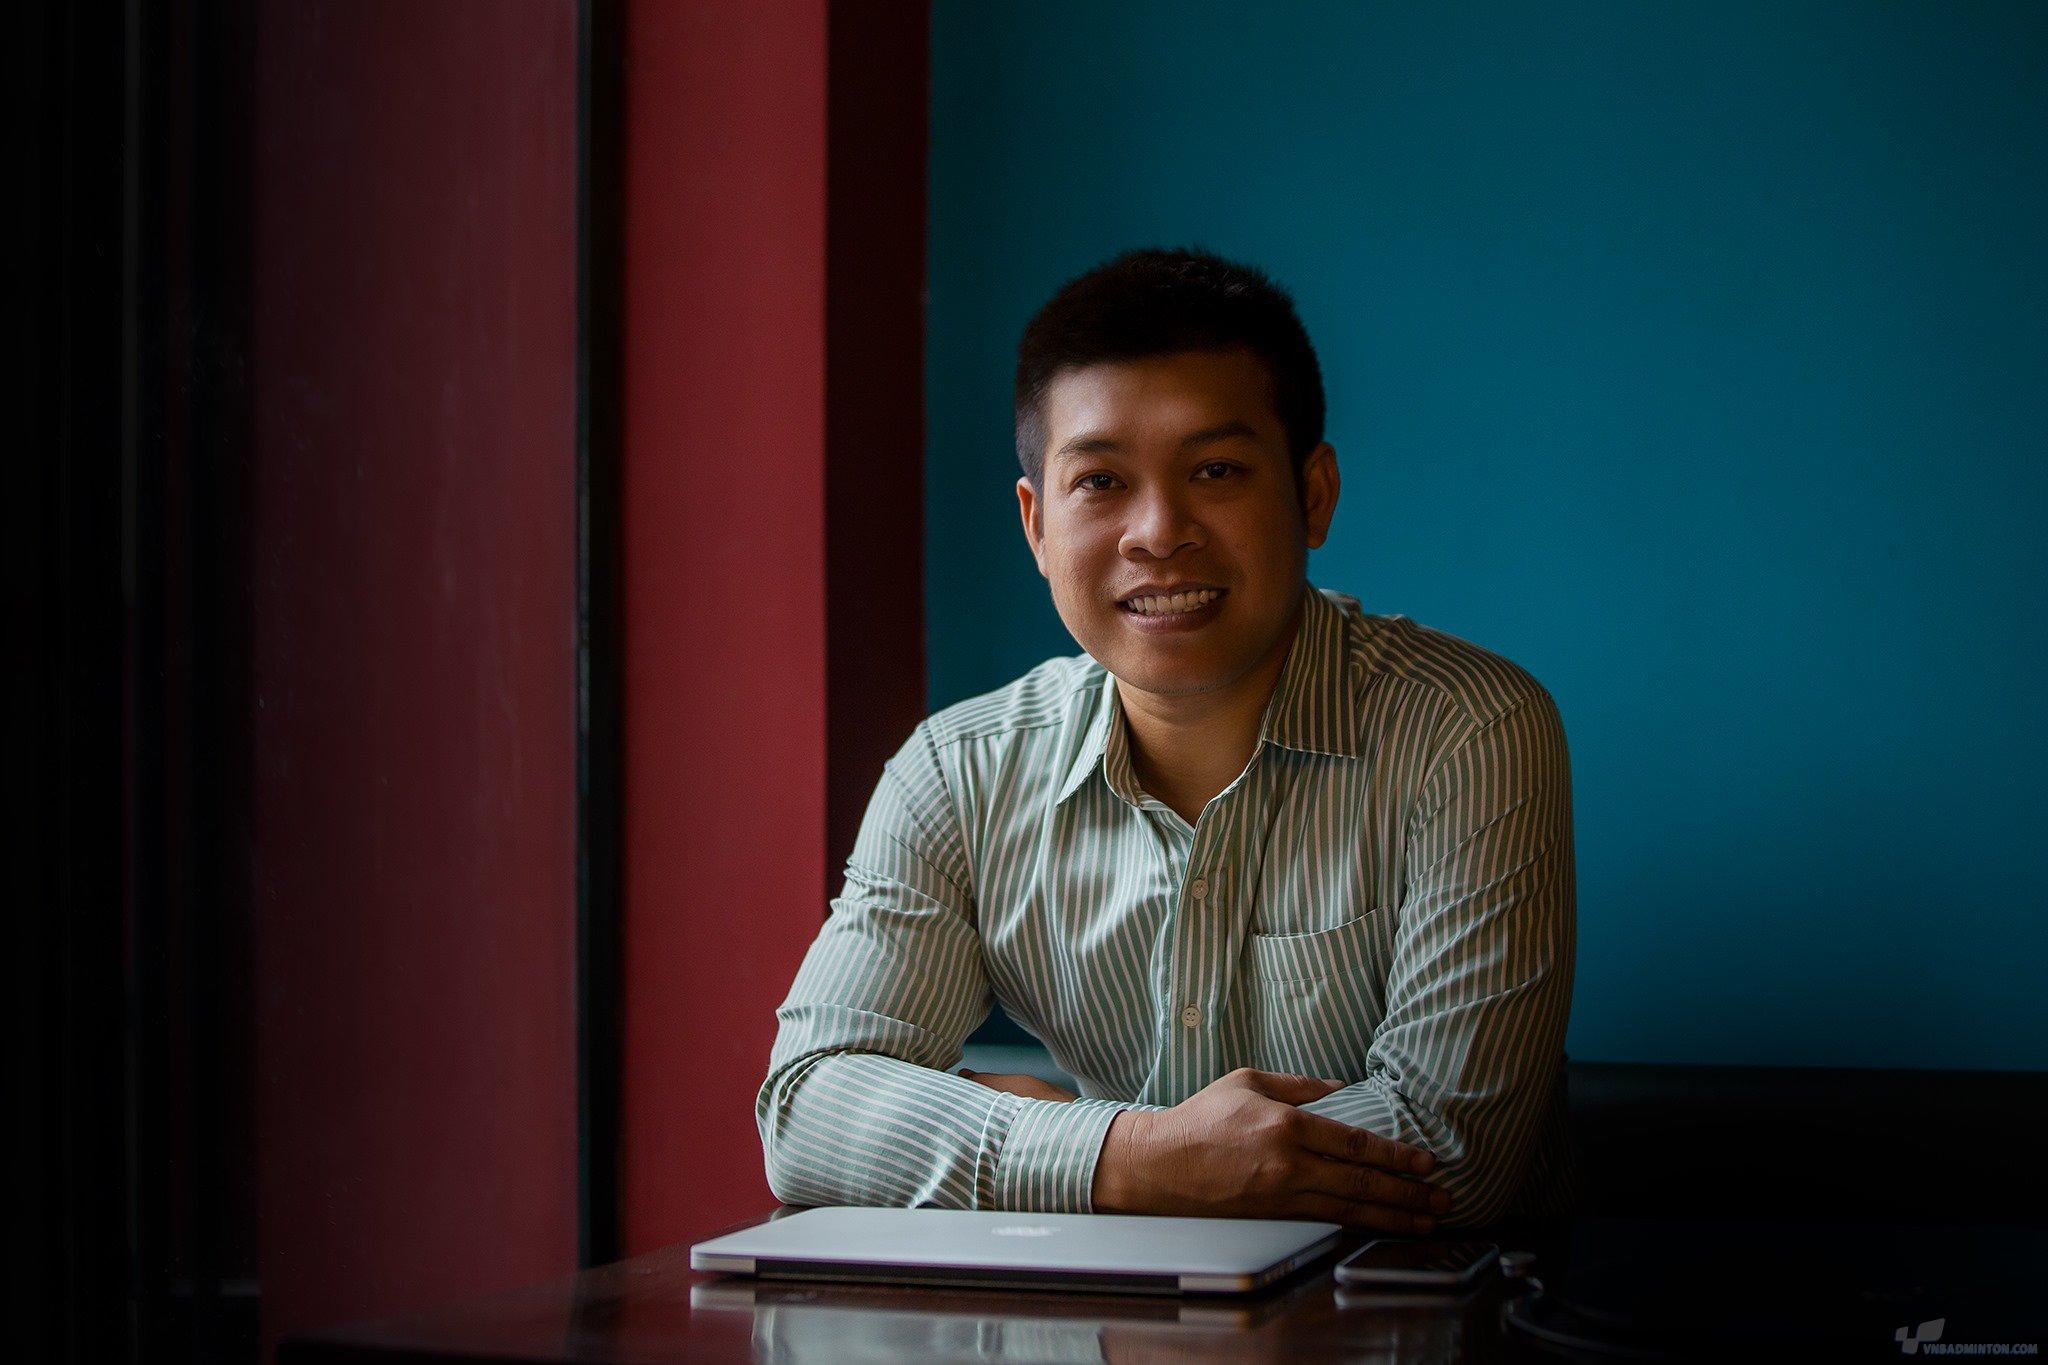 CEO Phan Tuấn Anh 1.jpg